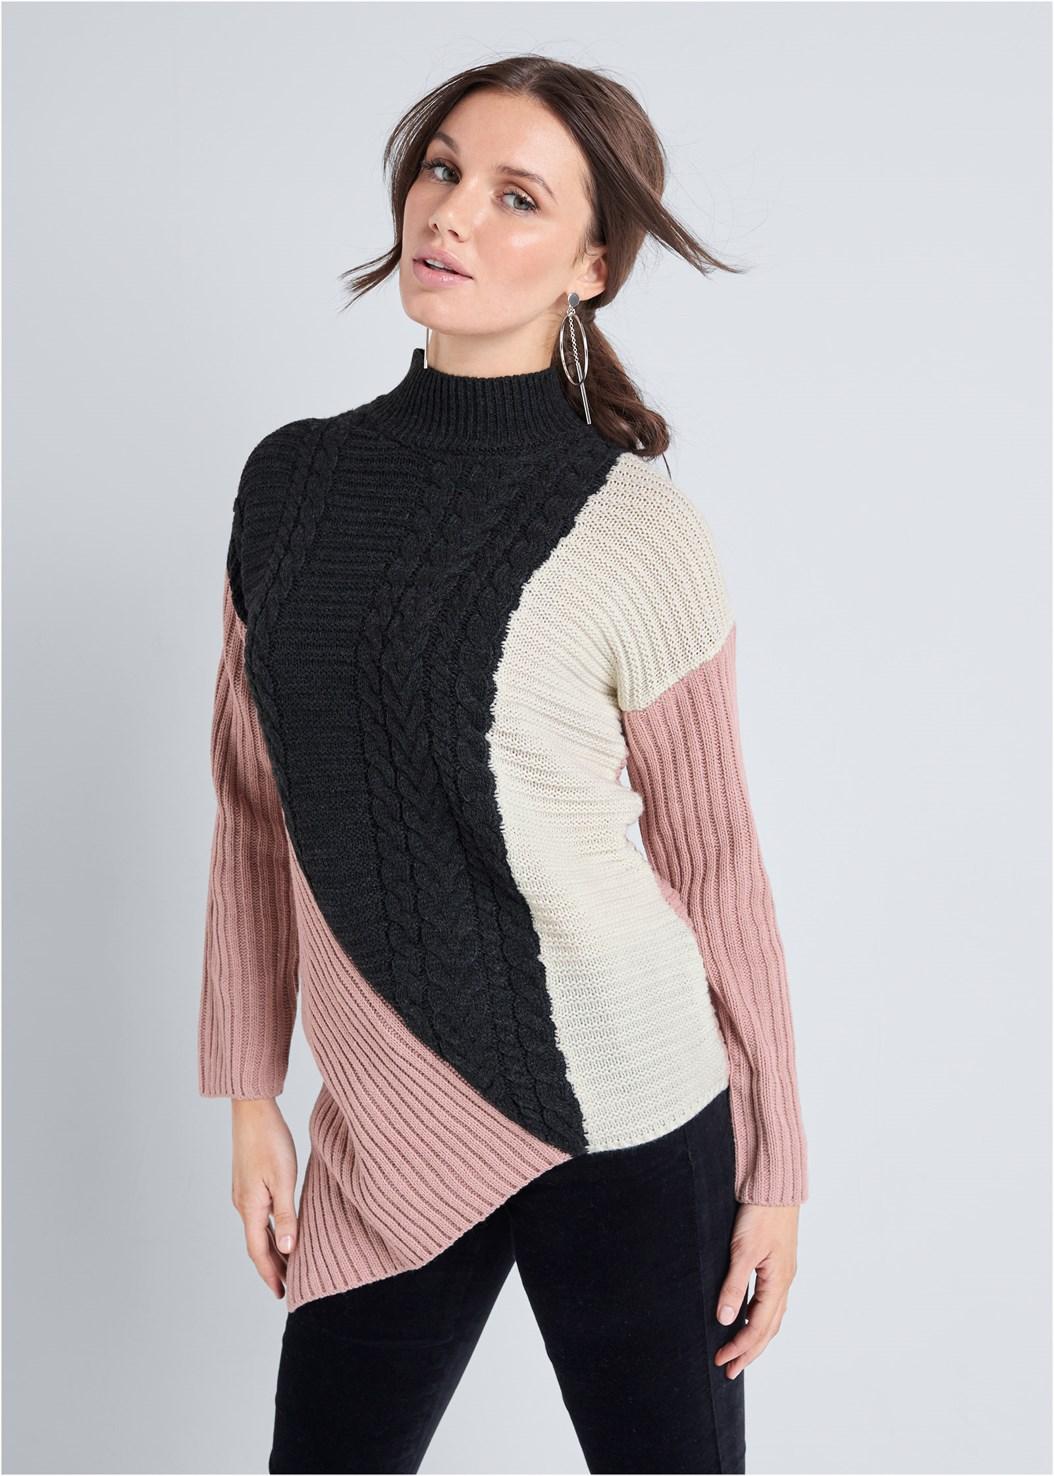 Asymmetrical Color Block Sweater,Velvet Pants,Seamless Unlined Bra,Hoop Detail Earrings